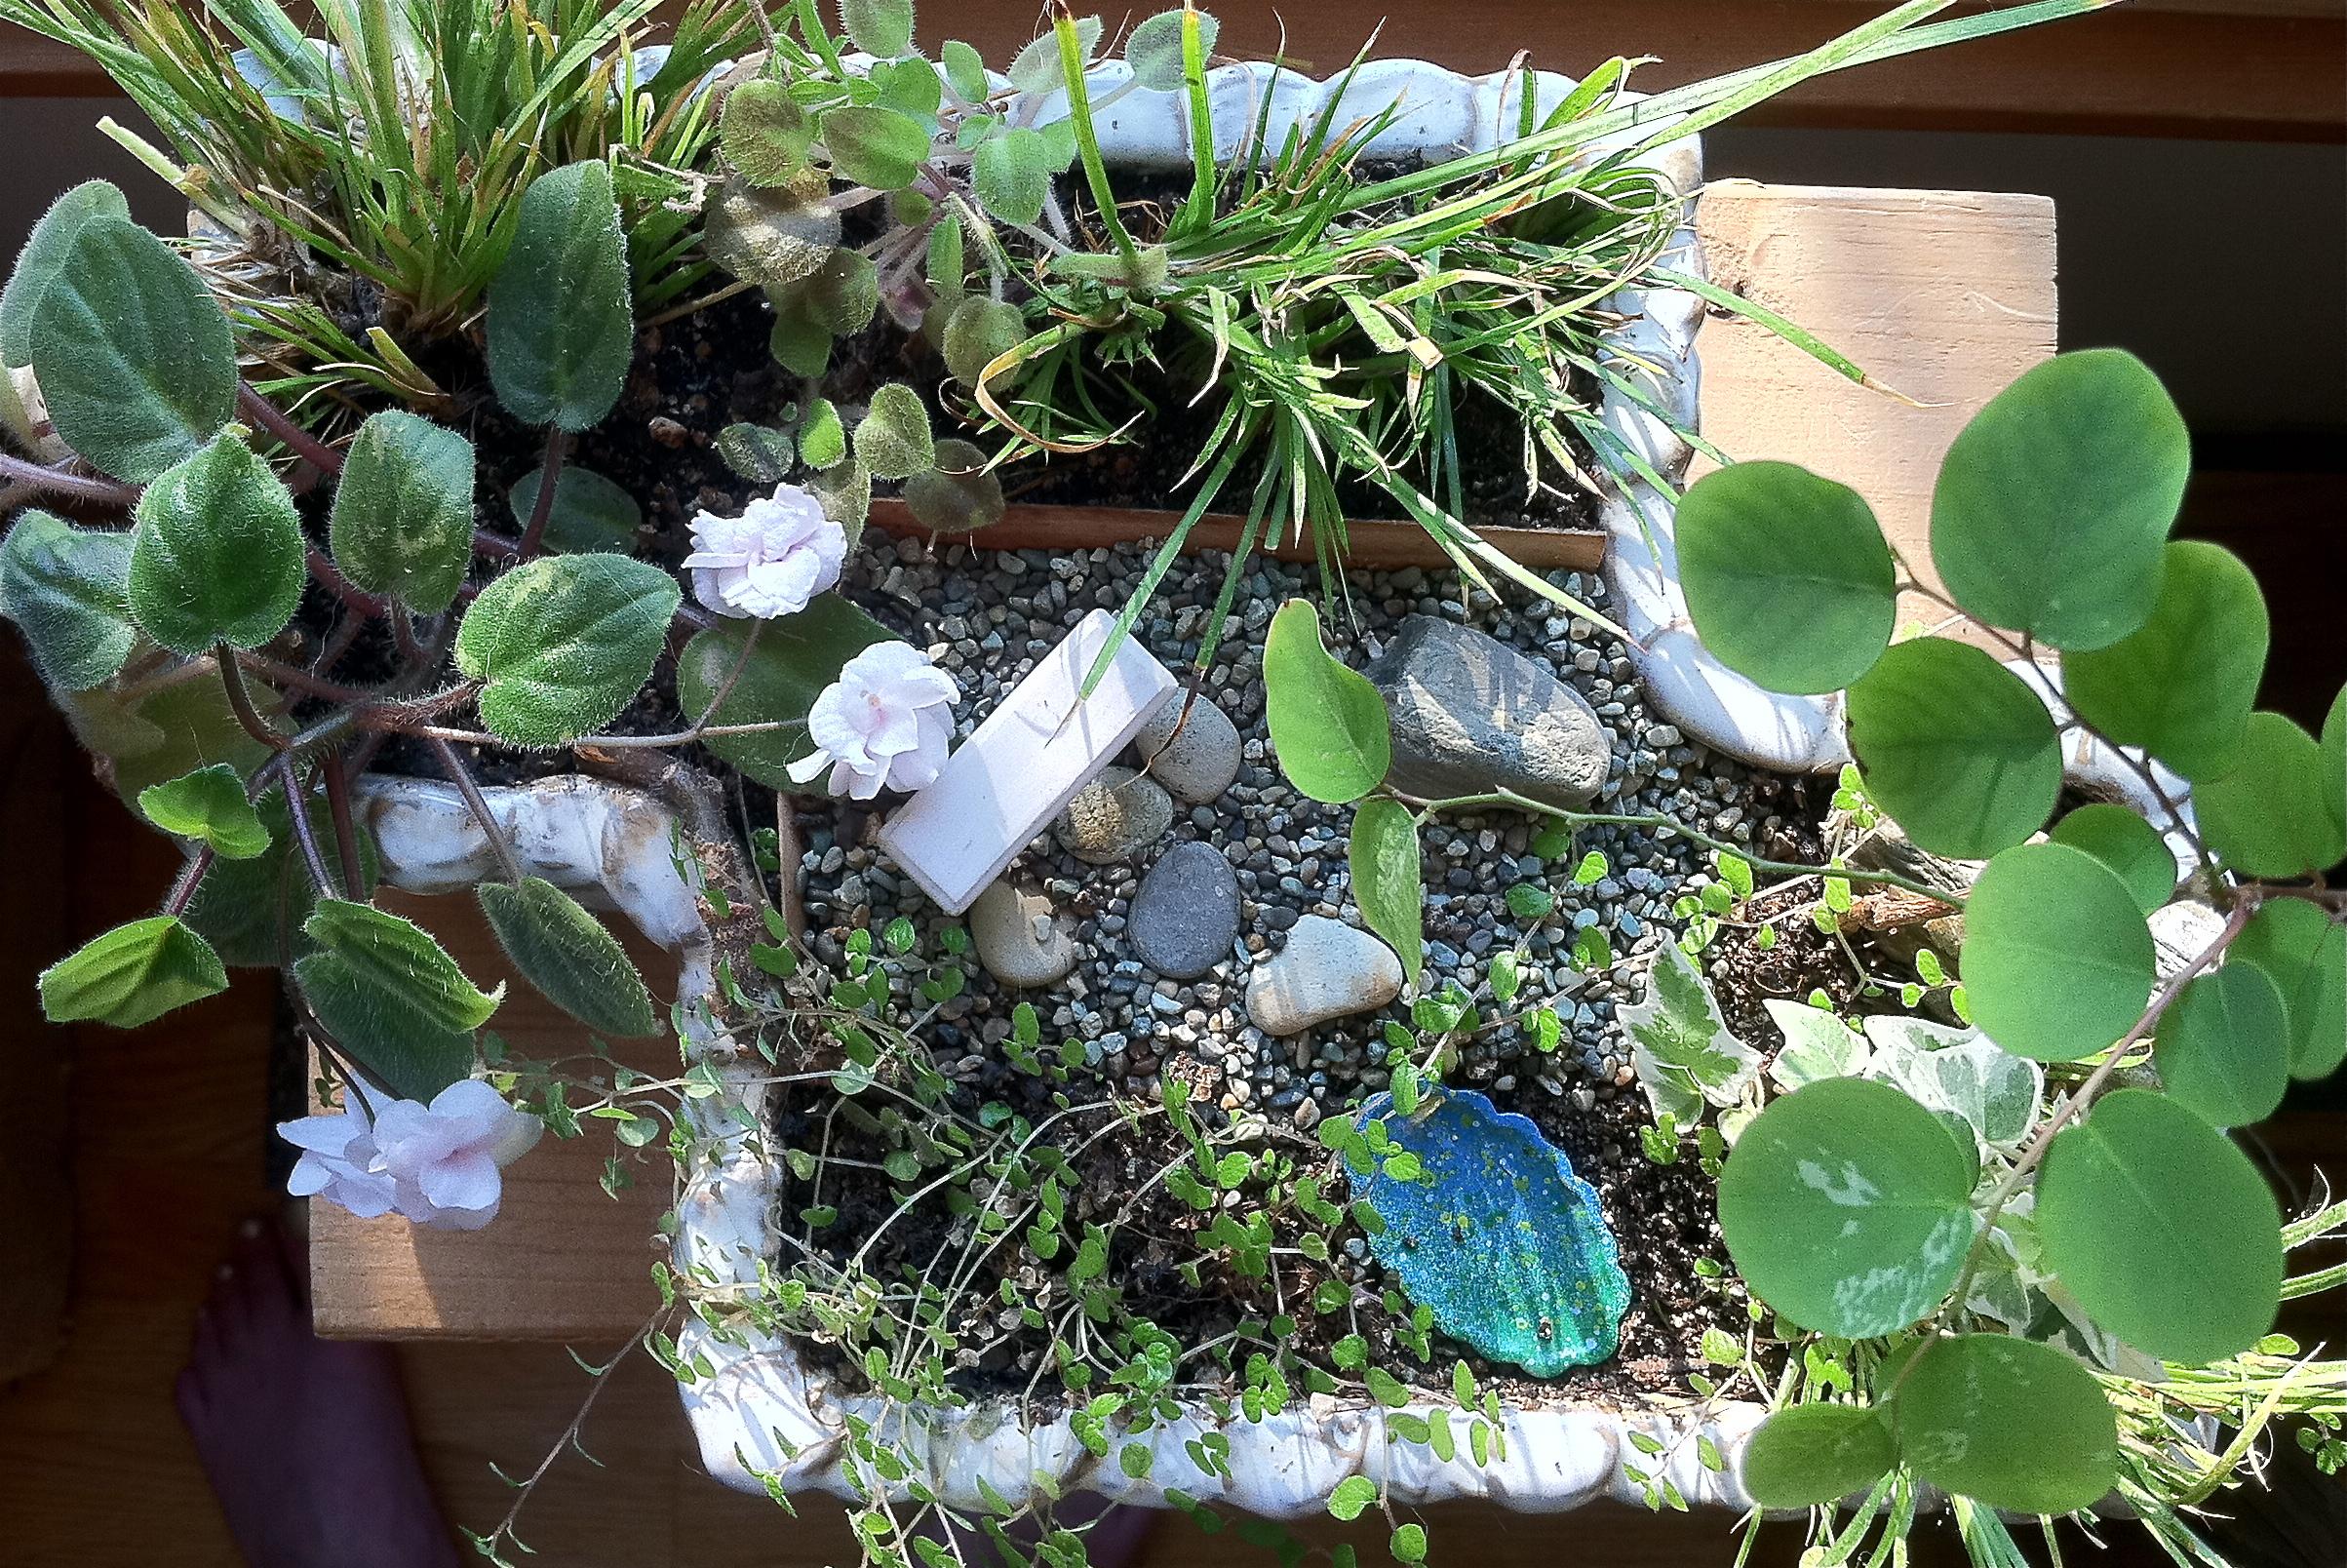 Miniature Dish Gardening is fun and rewarding.